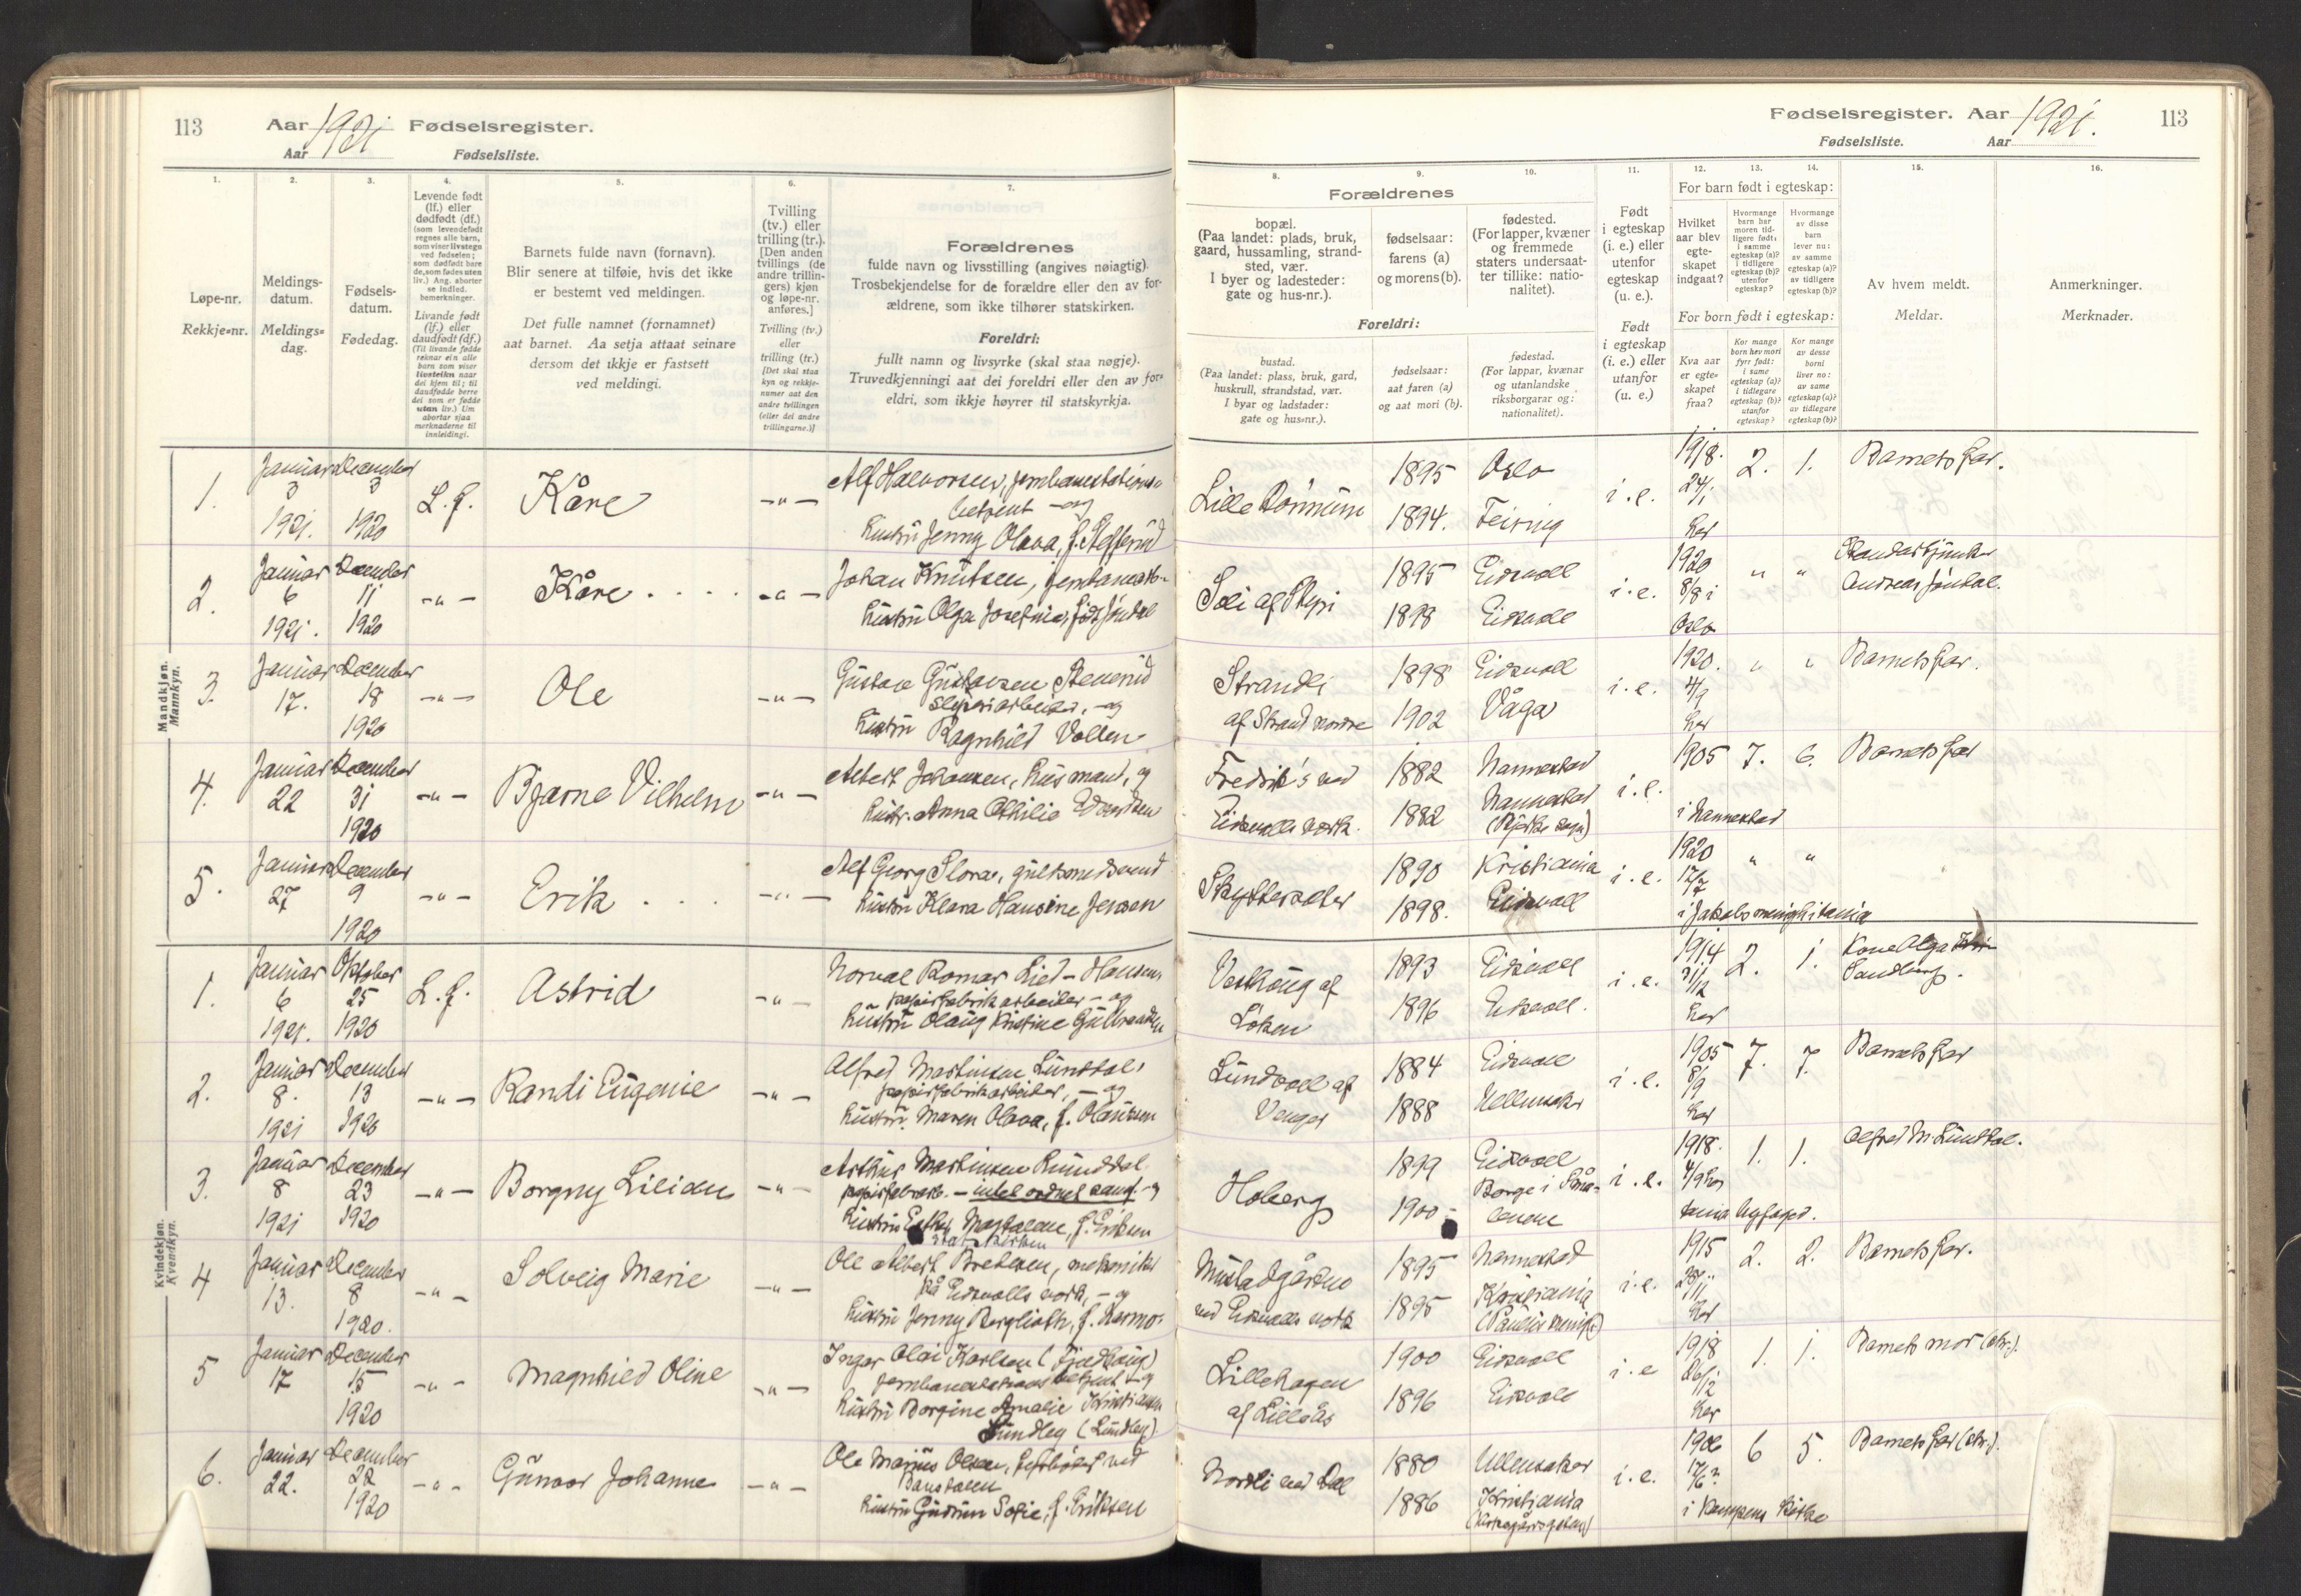 SAO, Eidsvoll prestekontor Kirkebøker, Birth register no. I 1, 1916-1924, p. 113